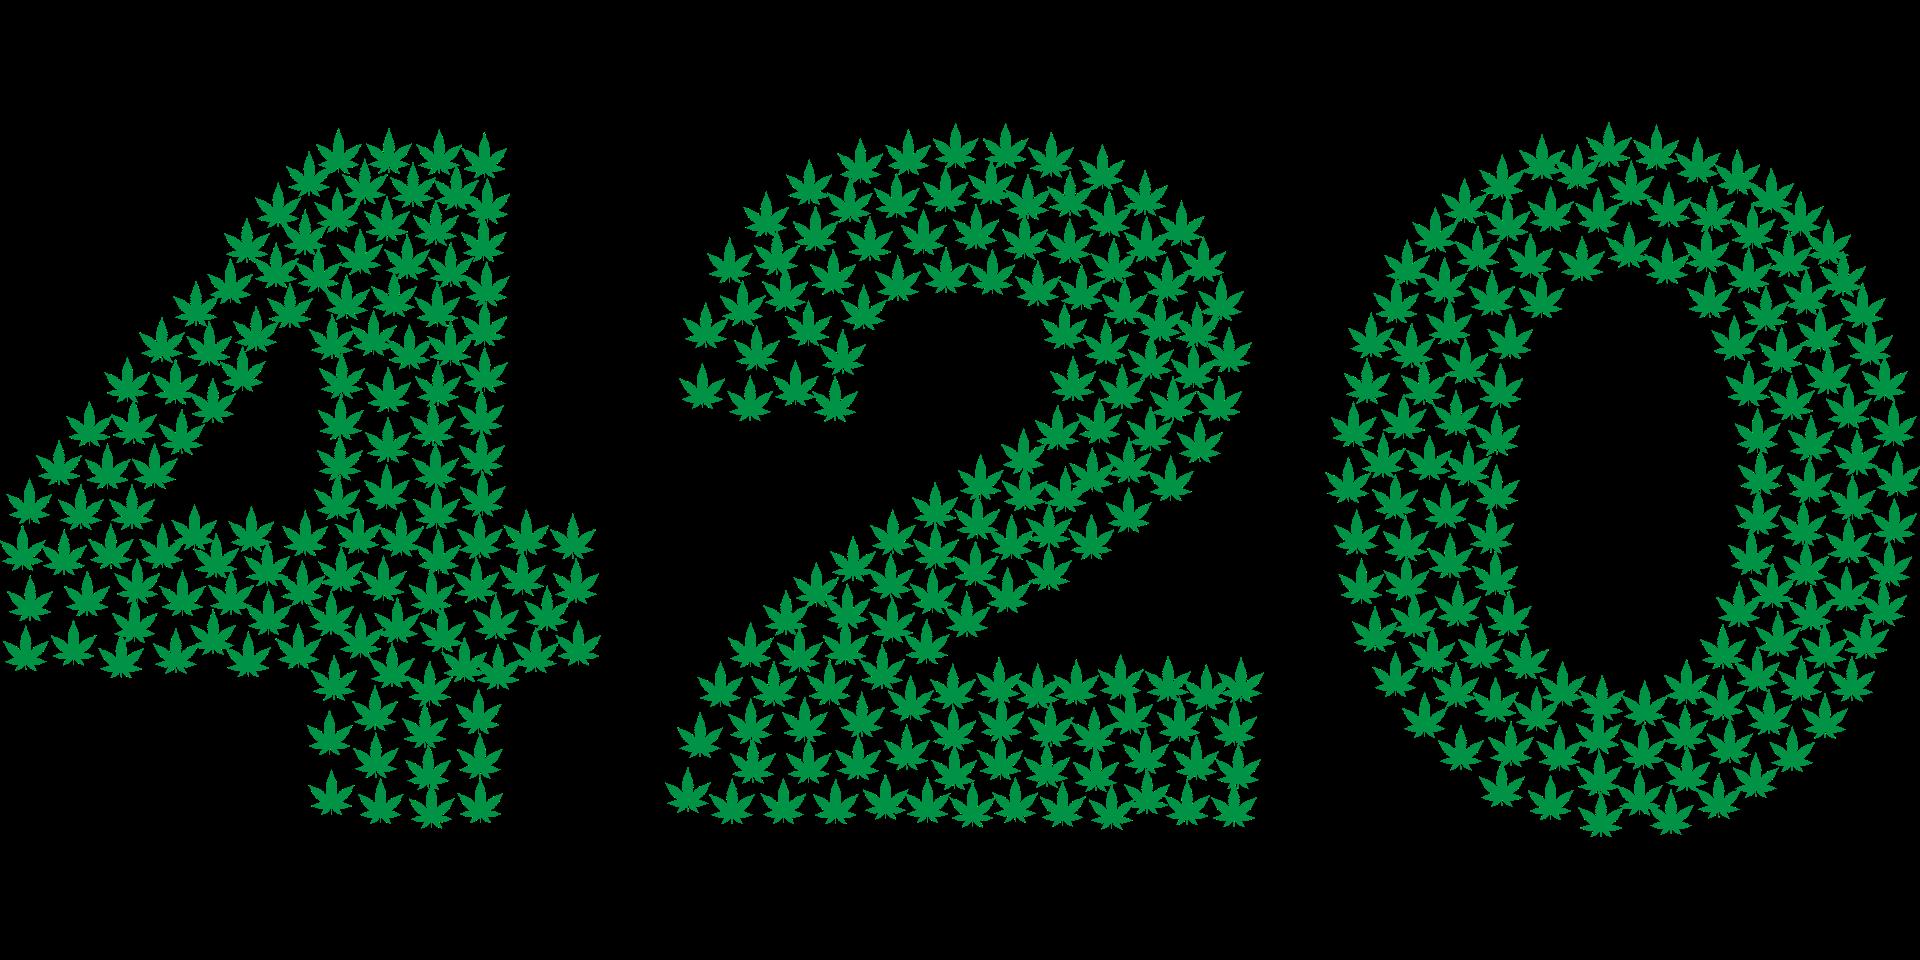 420 graphic